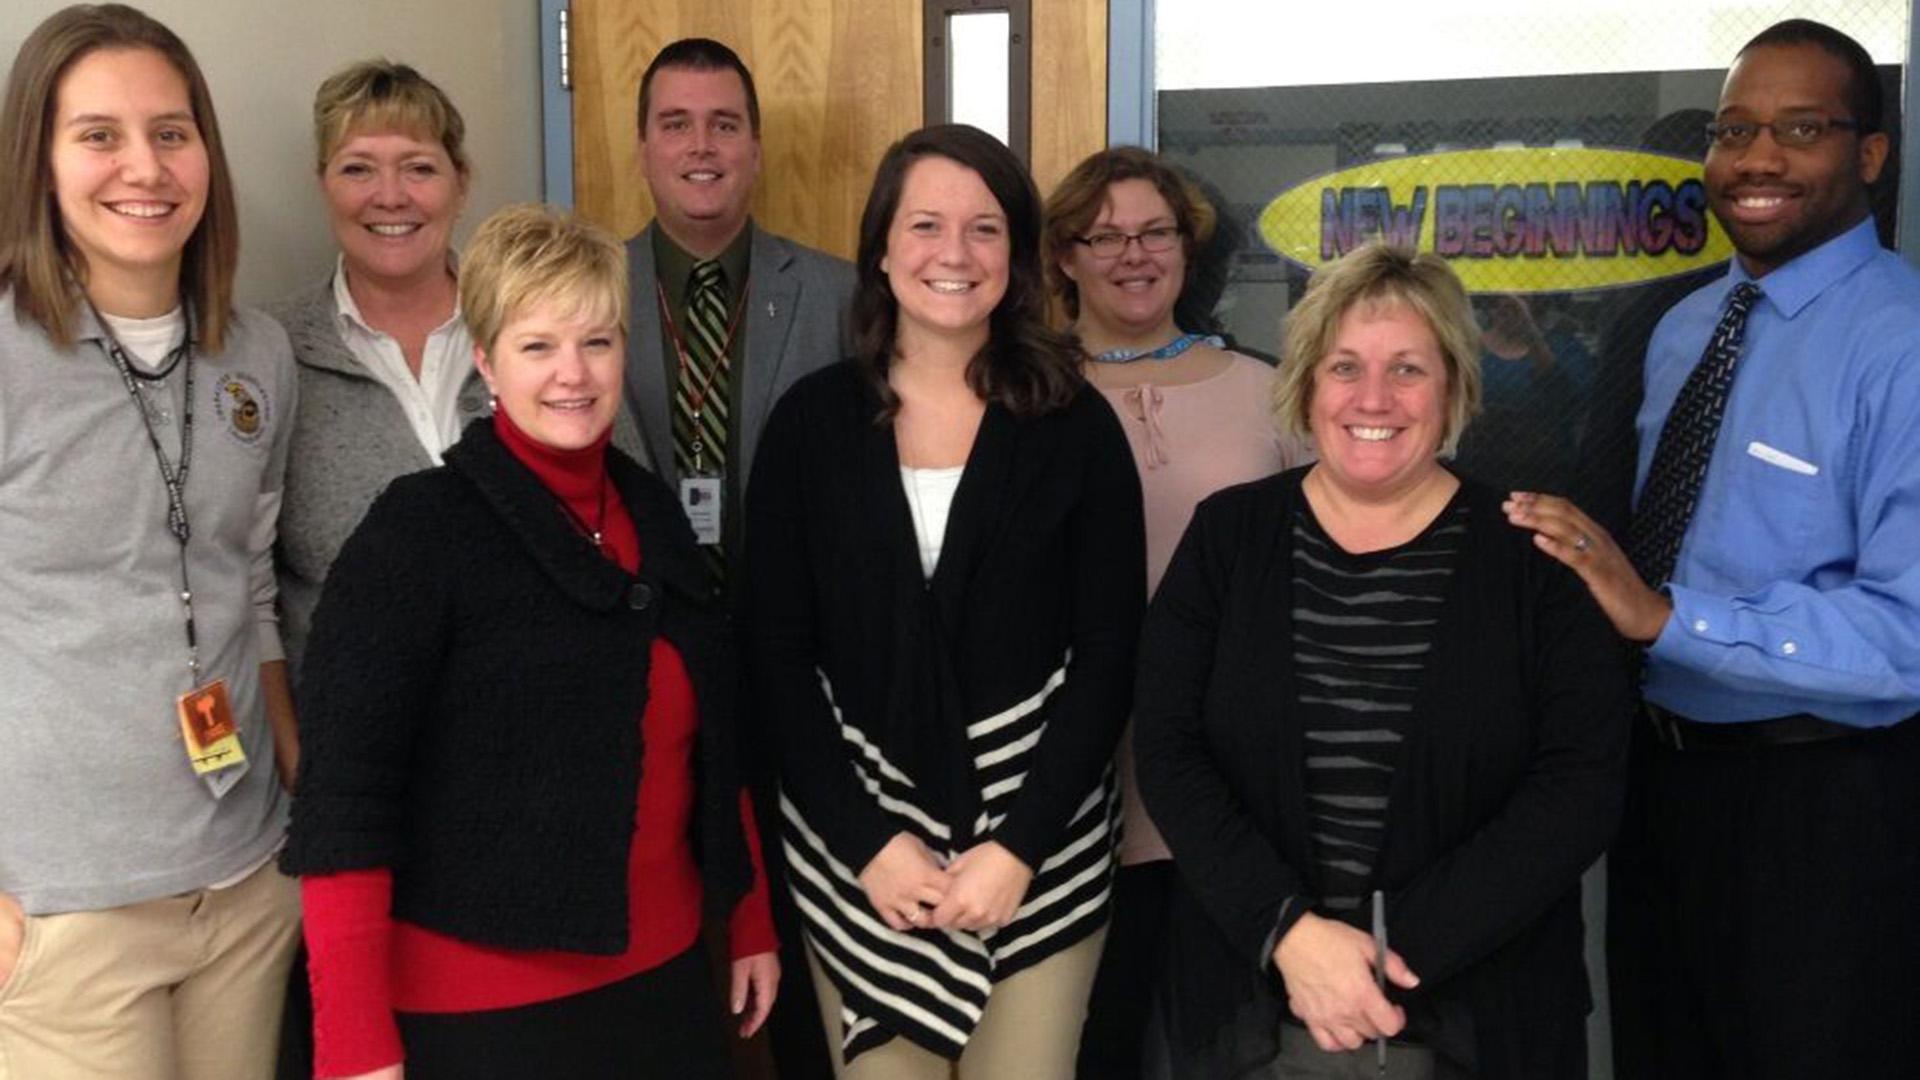 New Beginnings Changed Student Behavior At Allen Elementary